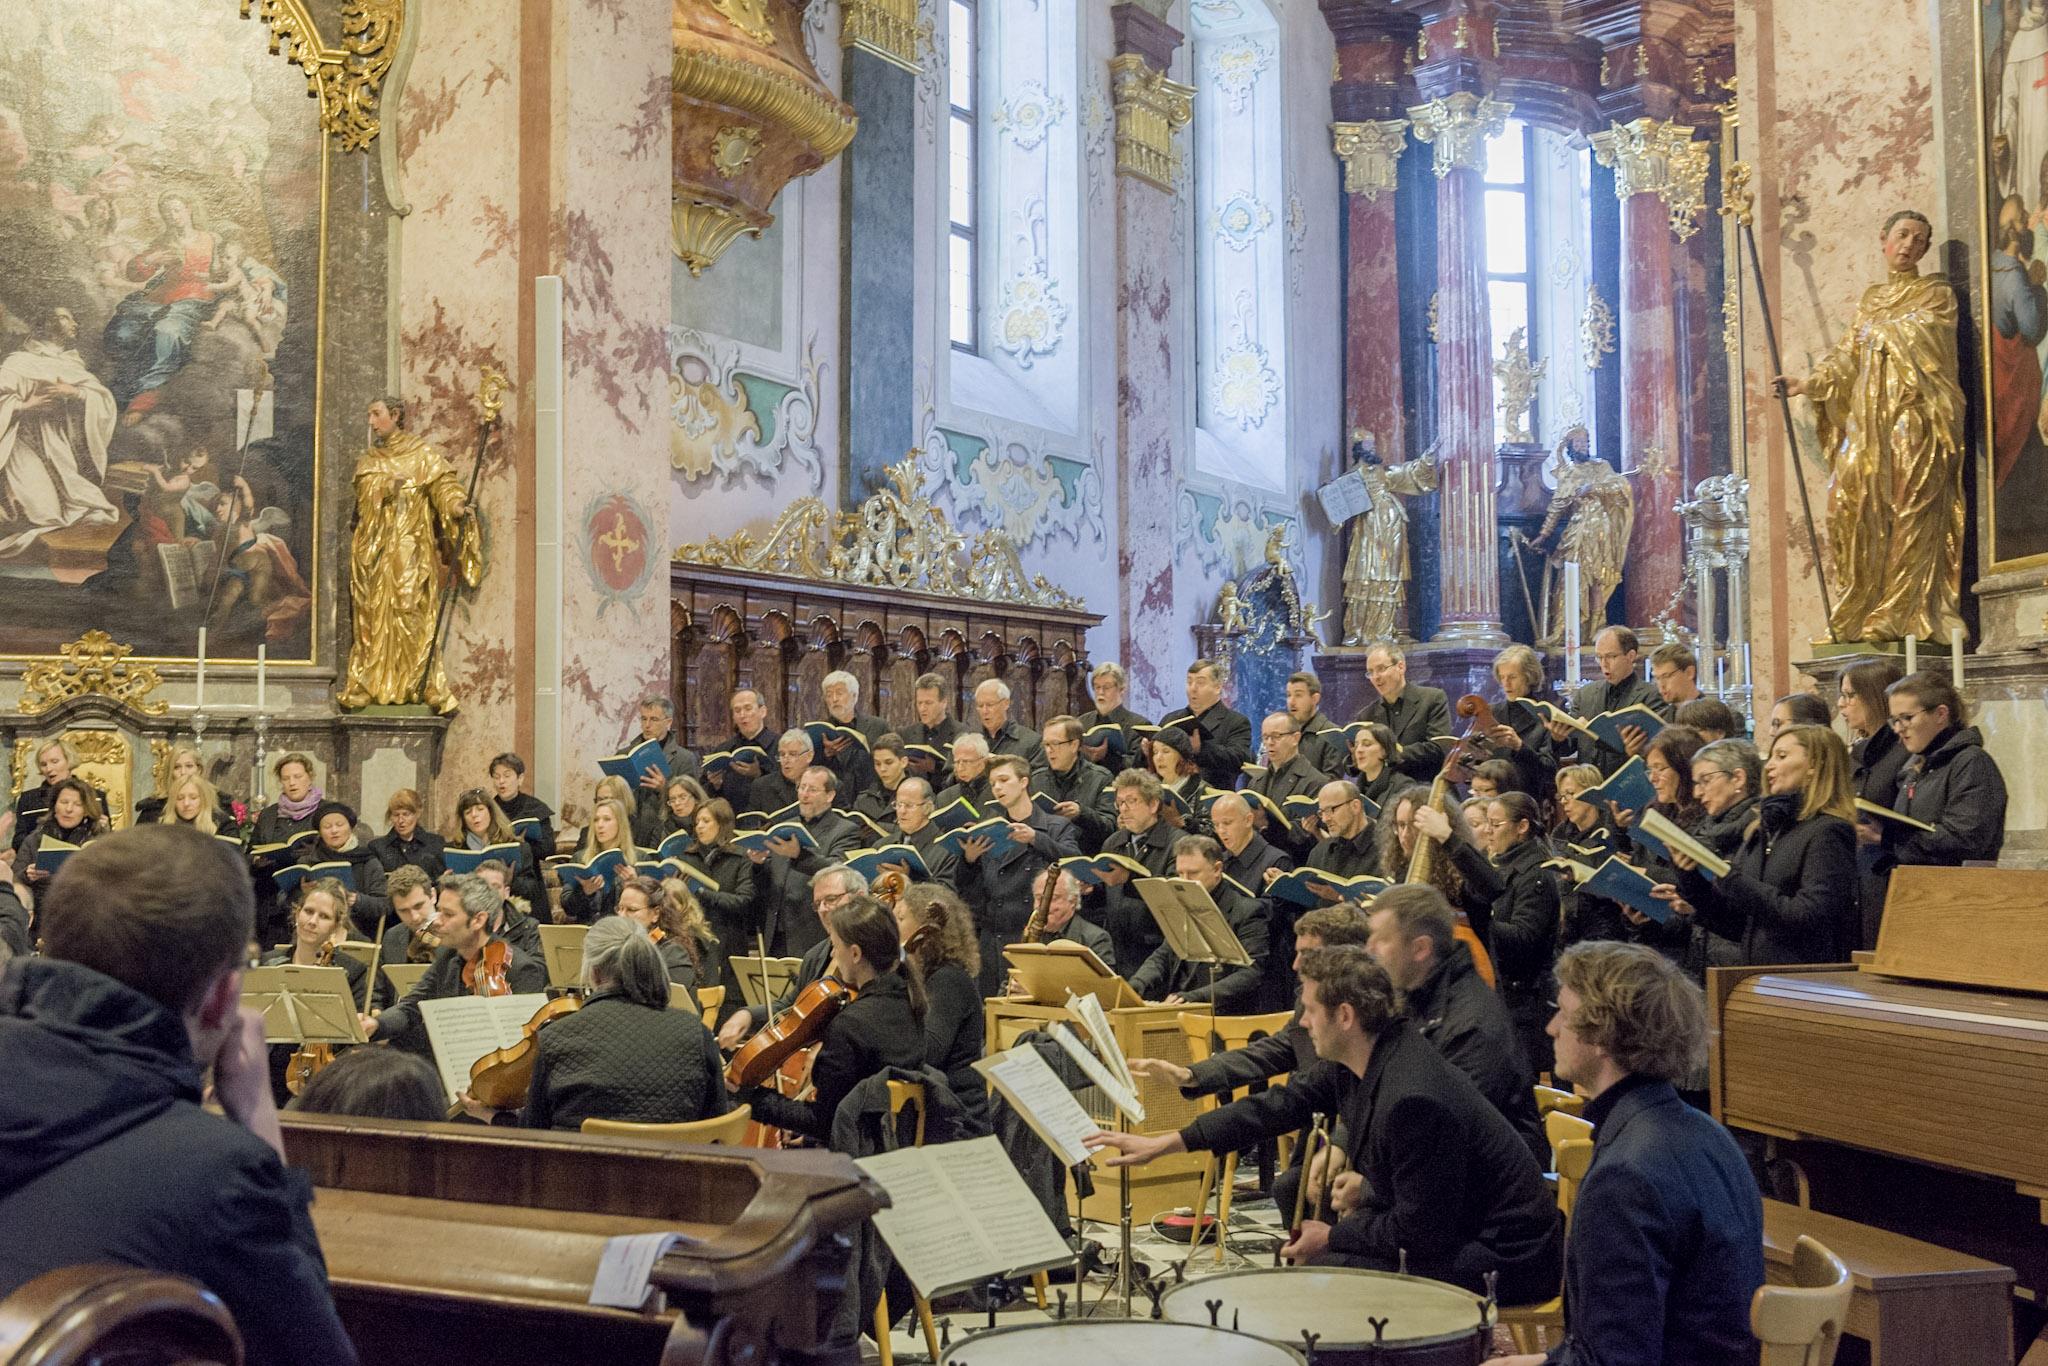 h-moll Messe, 2017